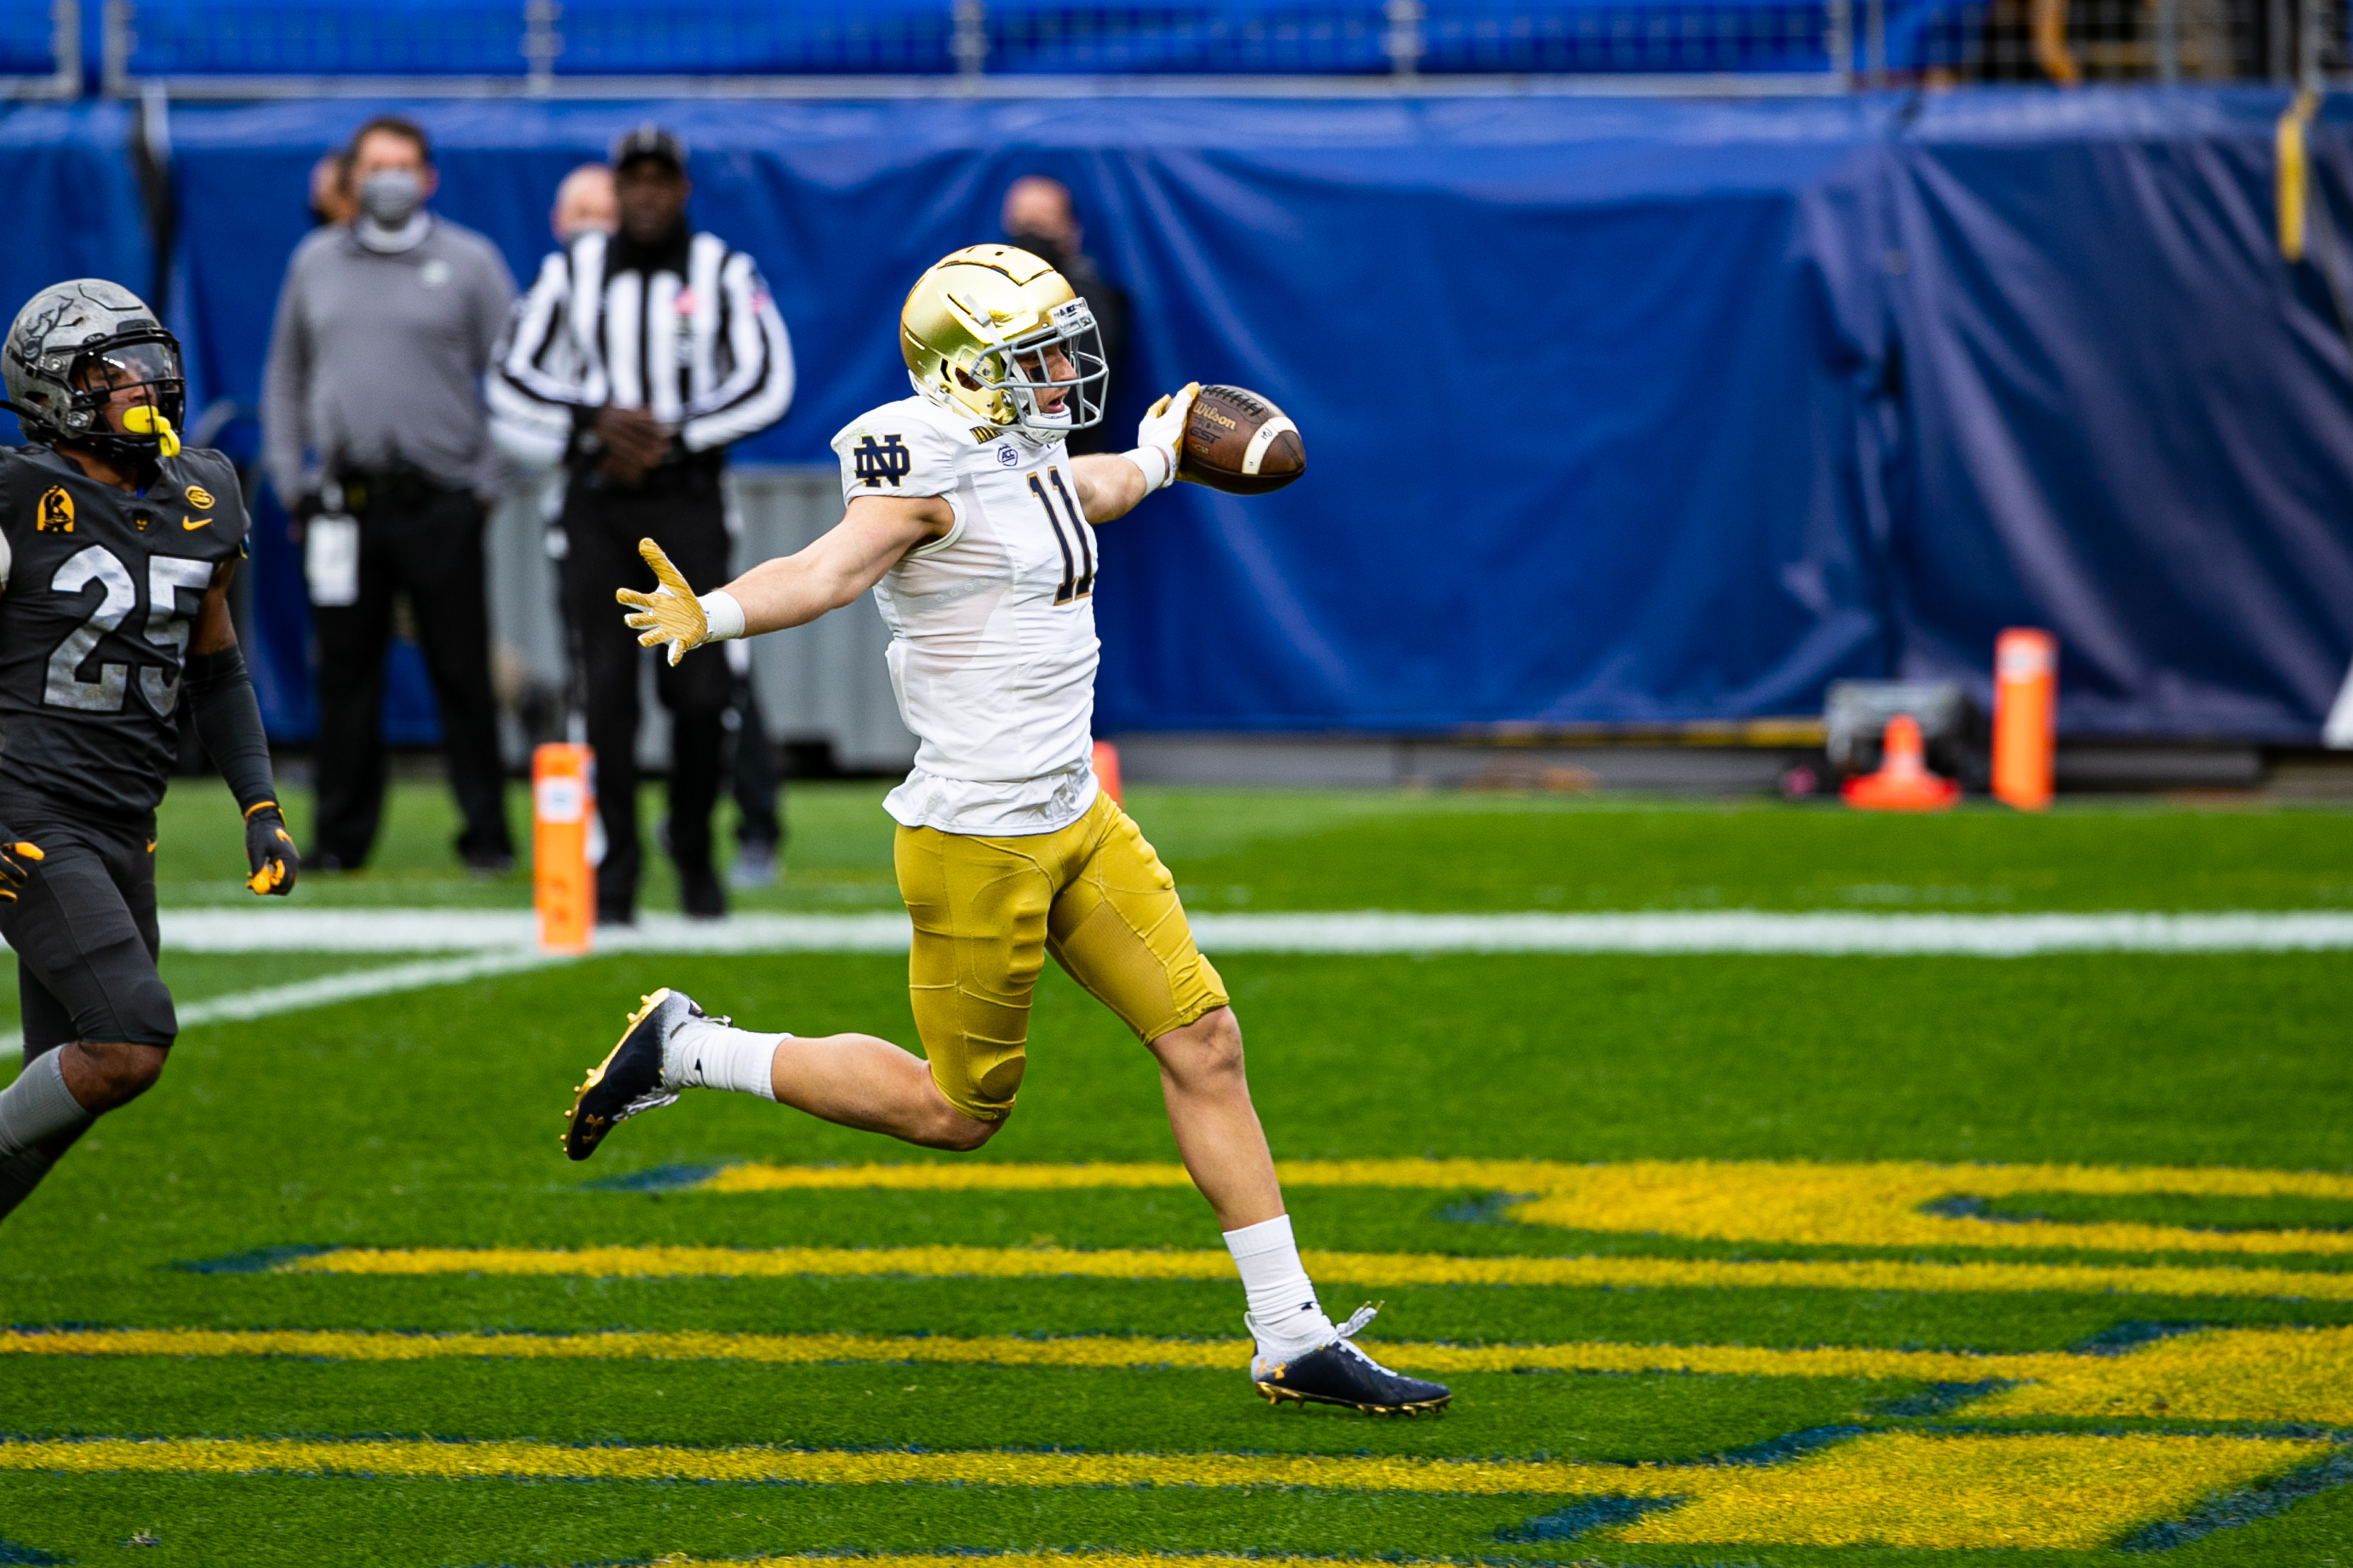 COLLEGE FOOTBALL: OCT 24 Notre Dame at Pitt